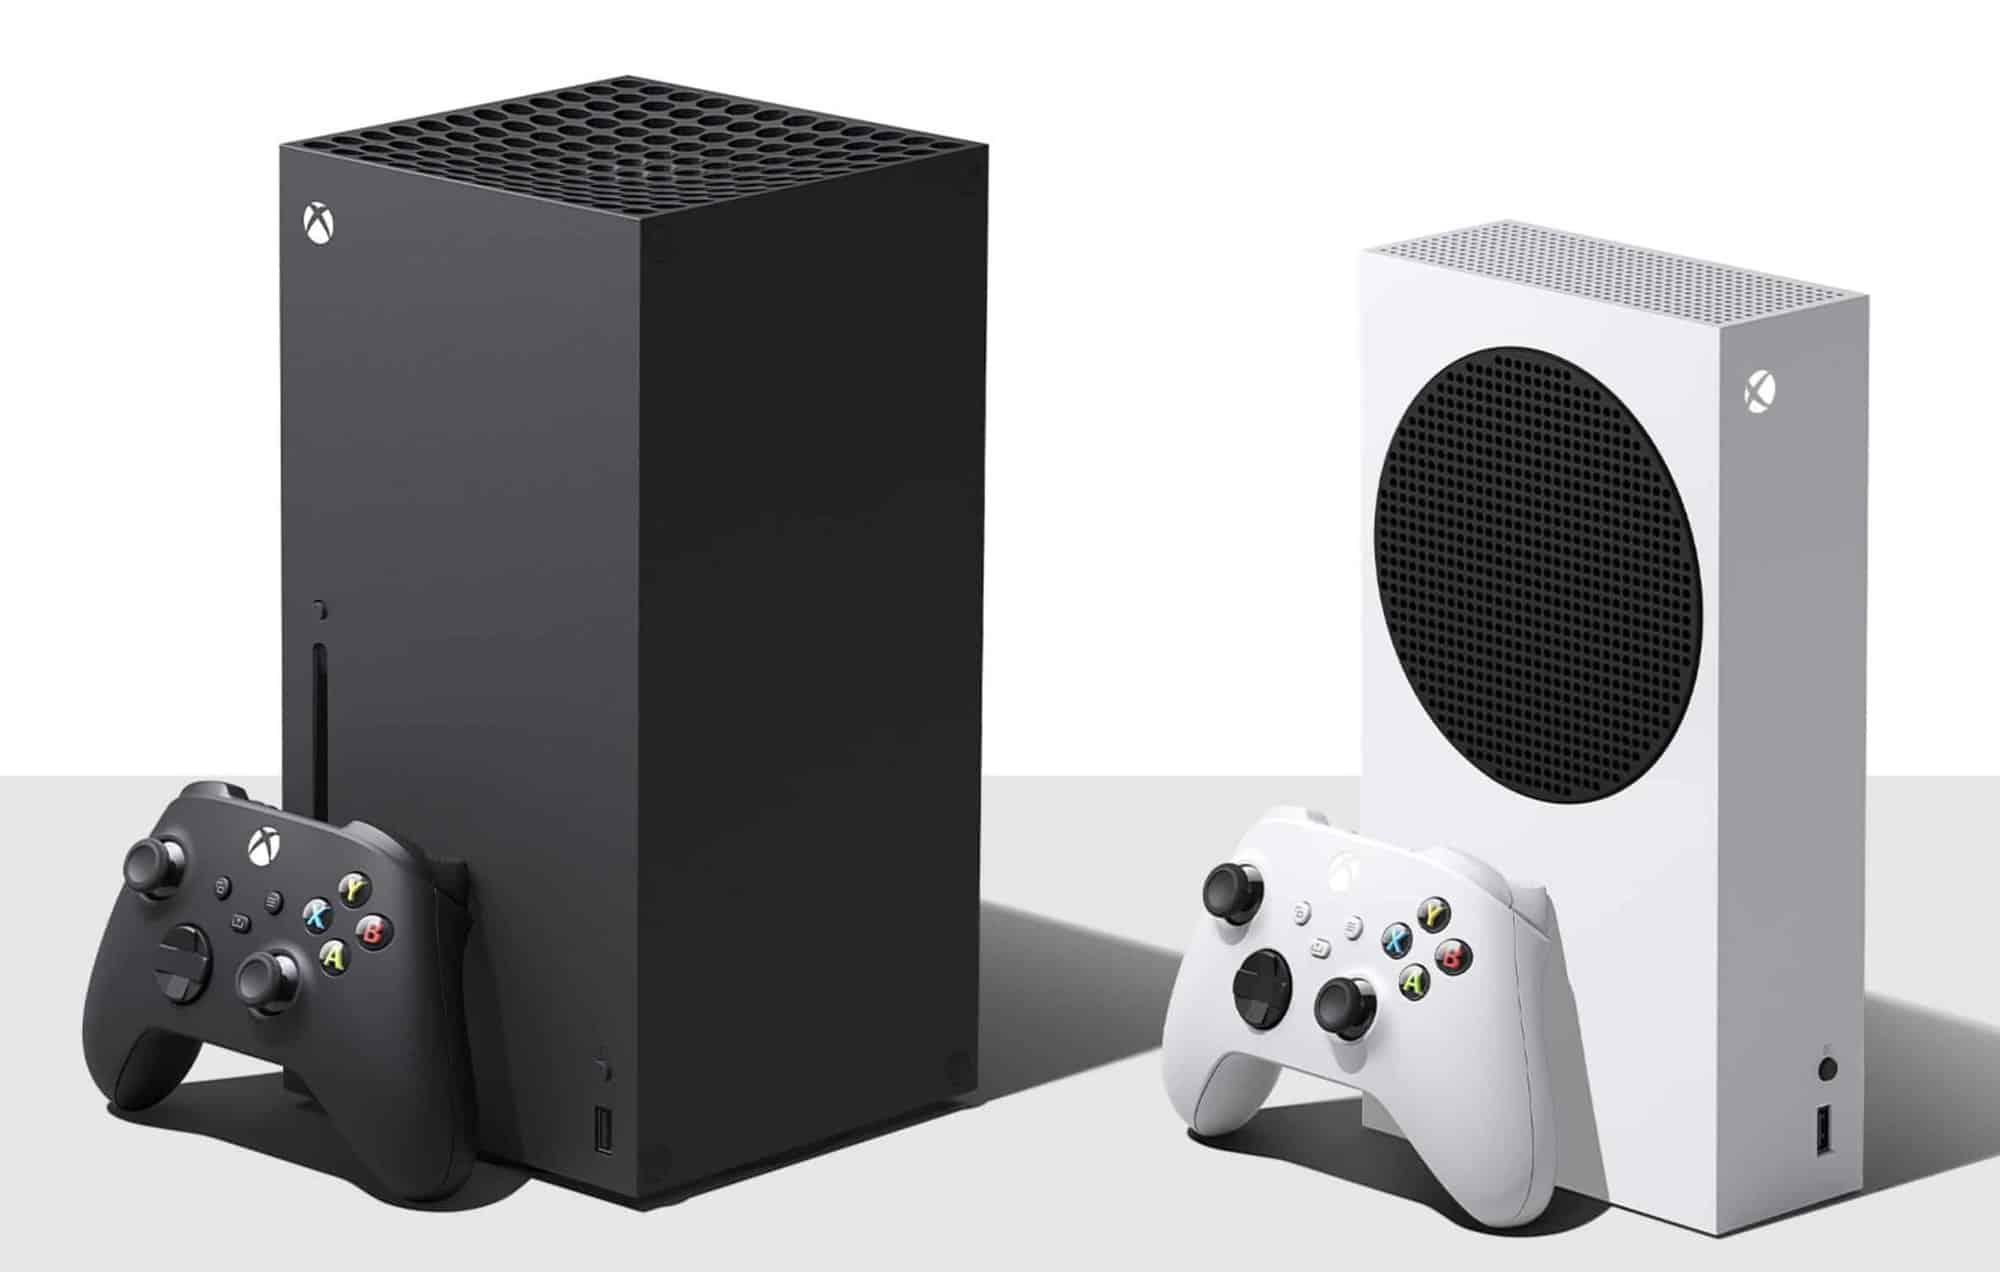 Microsoft mostra destaques do novo Xbox